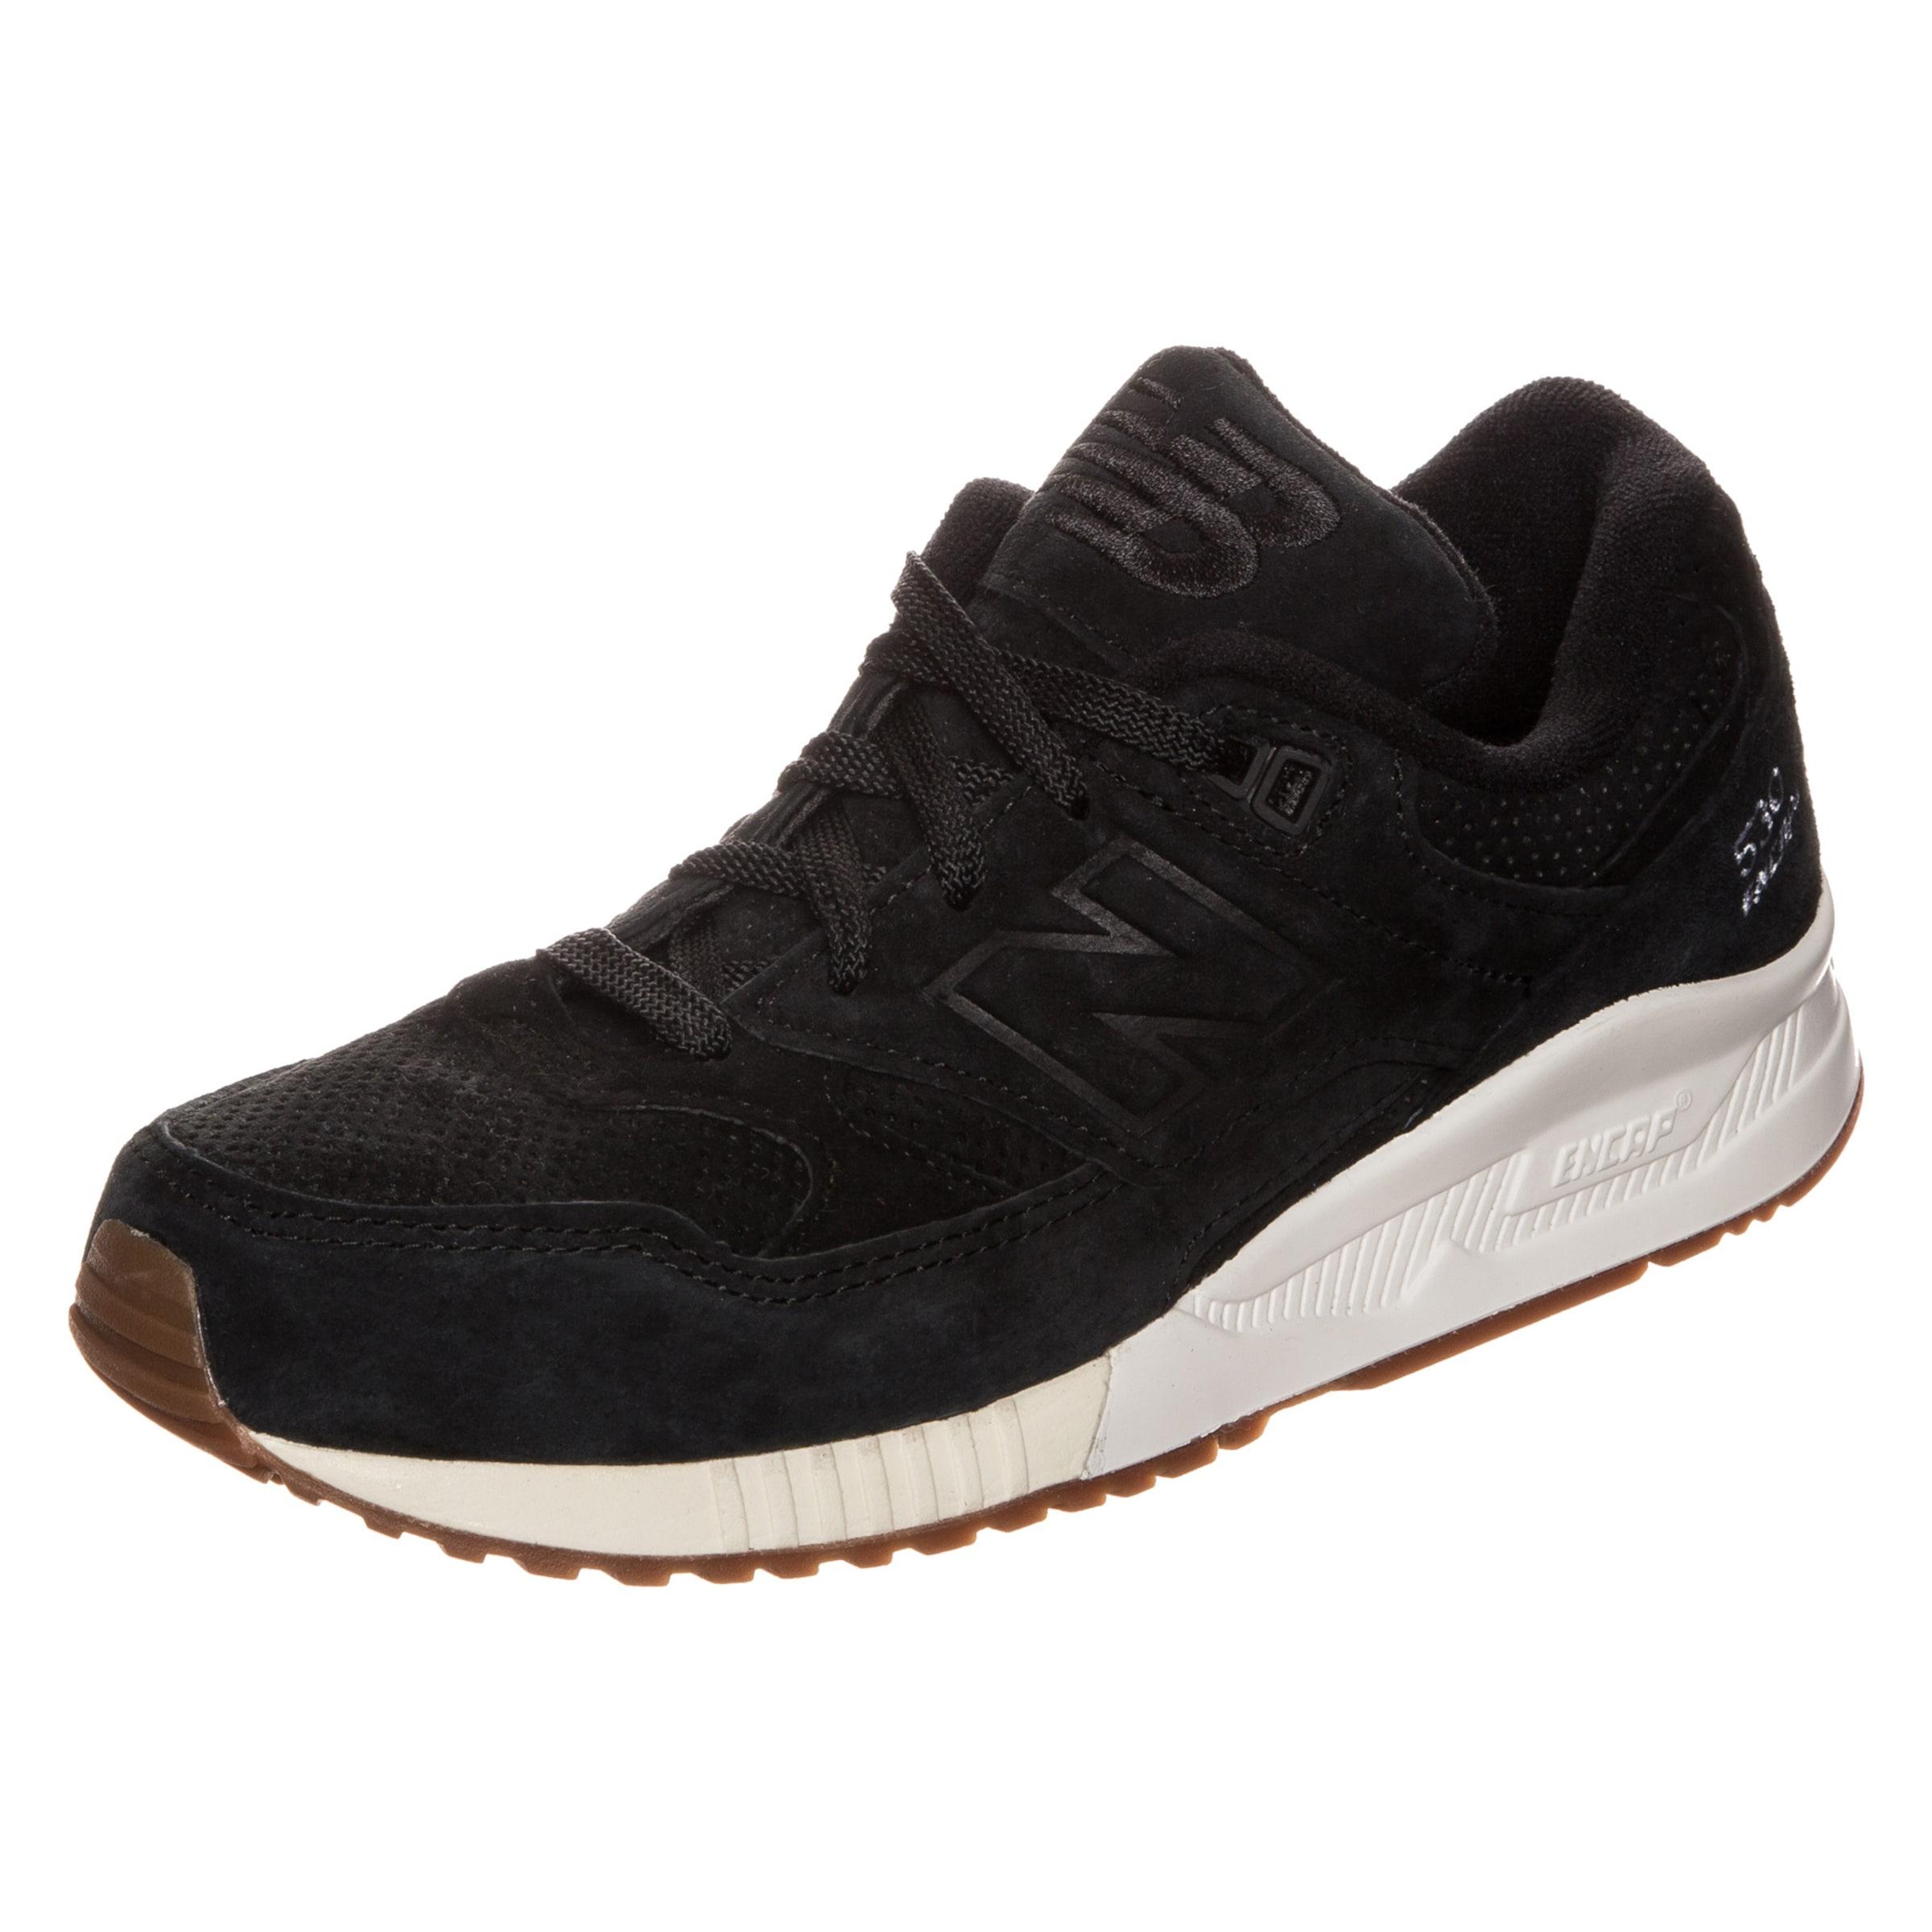 new balance Sneaker W530-PRA-B Verschleißfeste billige Schuhe